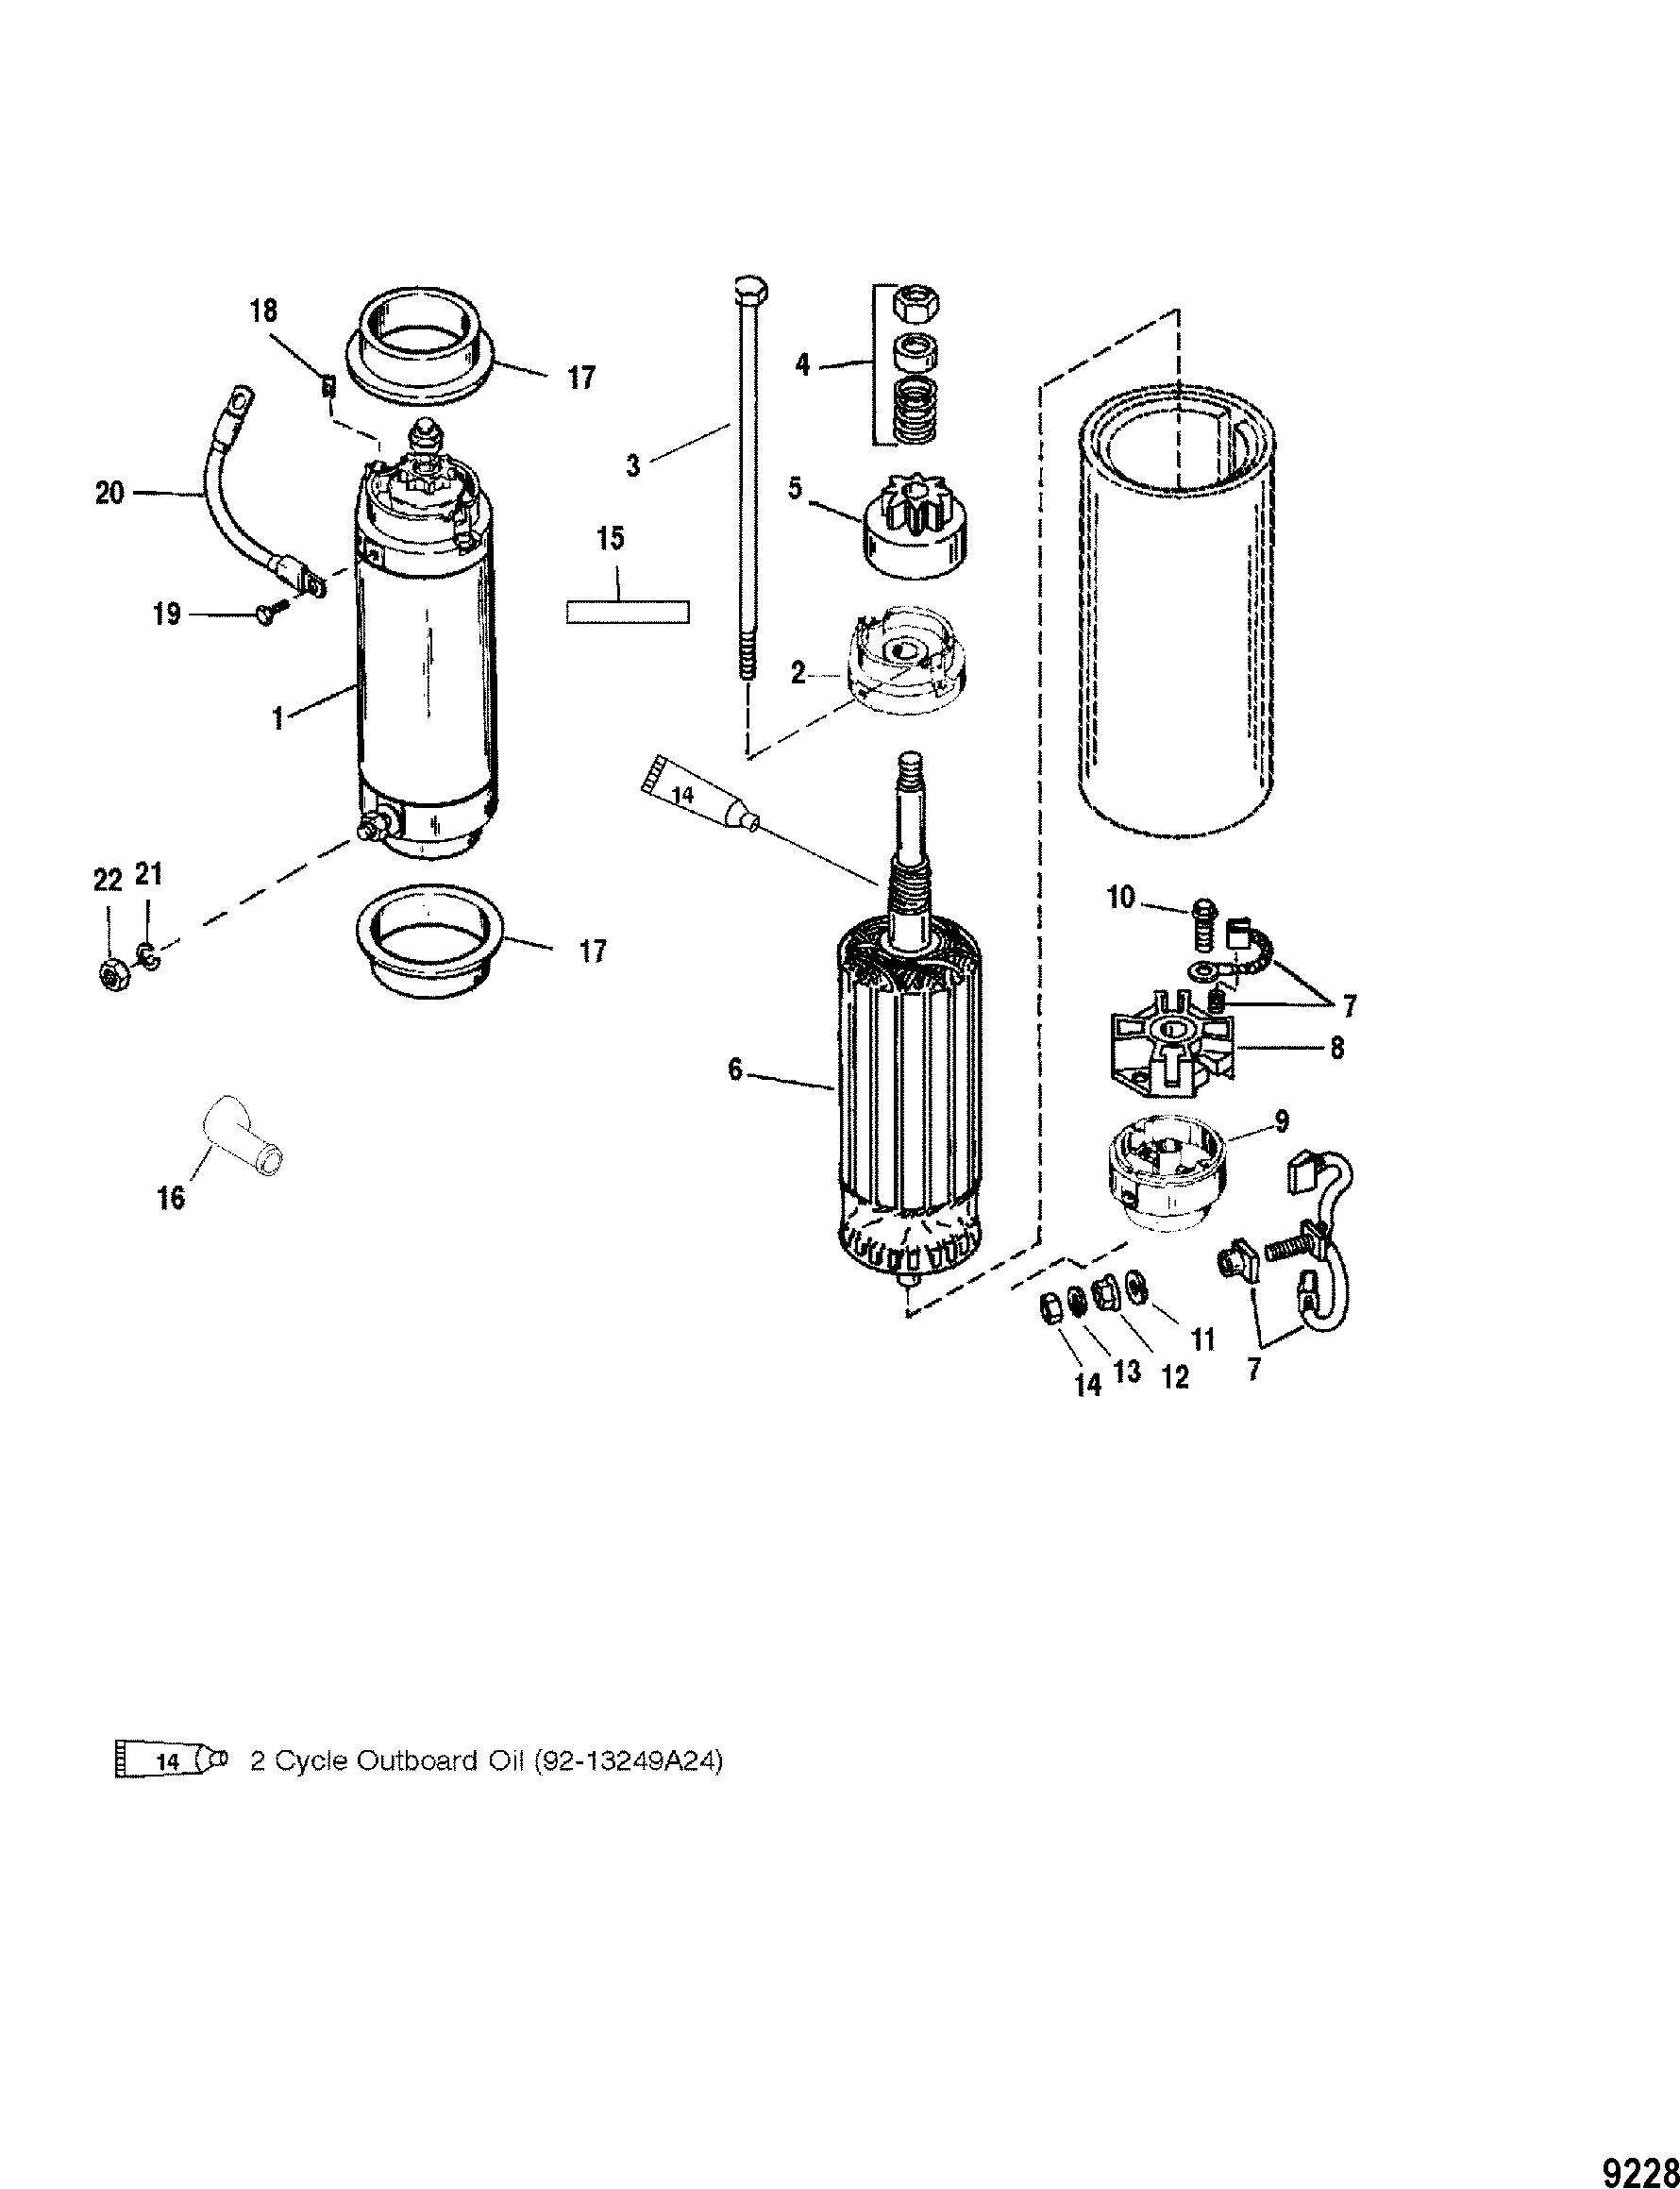 Каталог запчастей MARINER V-135 DFI (2.5L) 0G960500 THRU